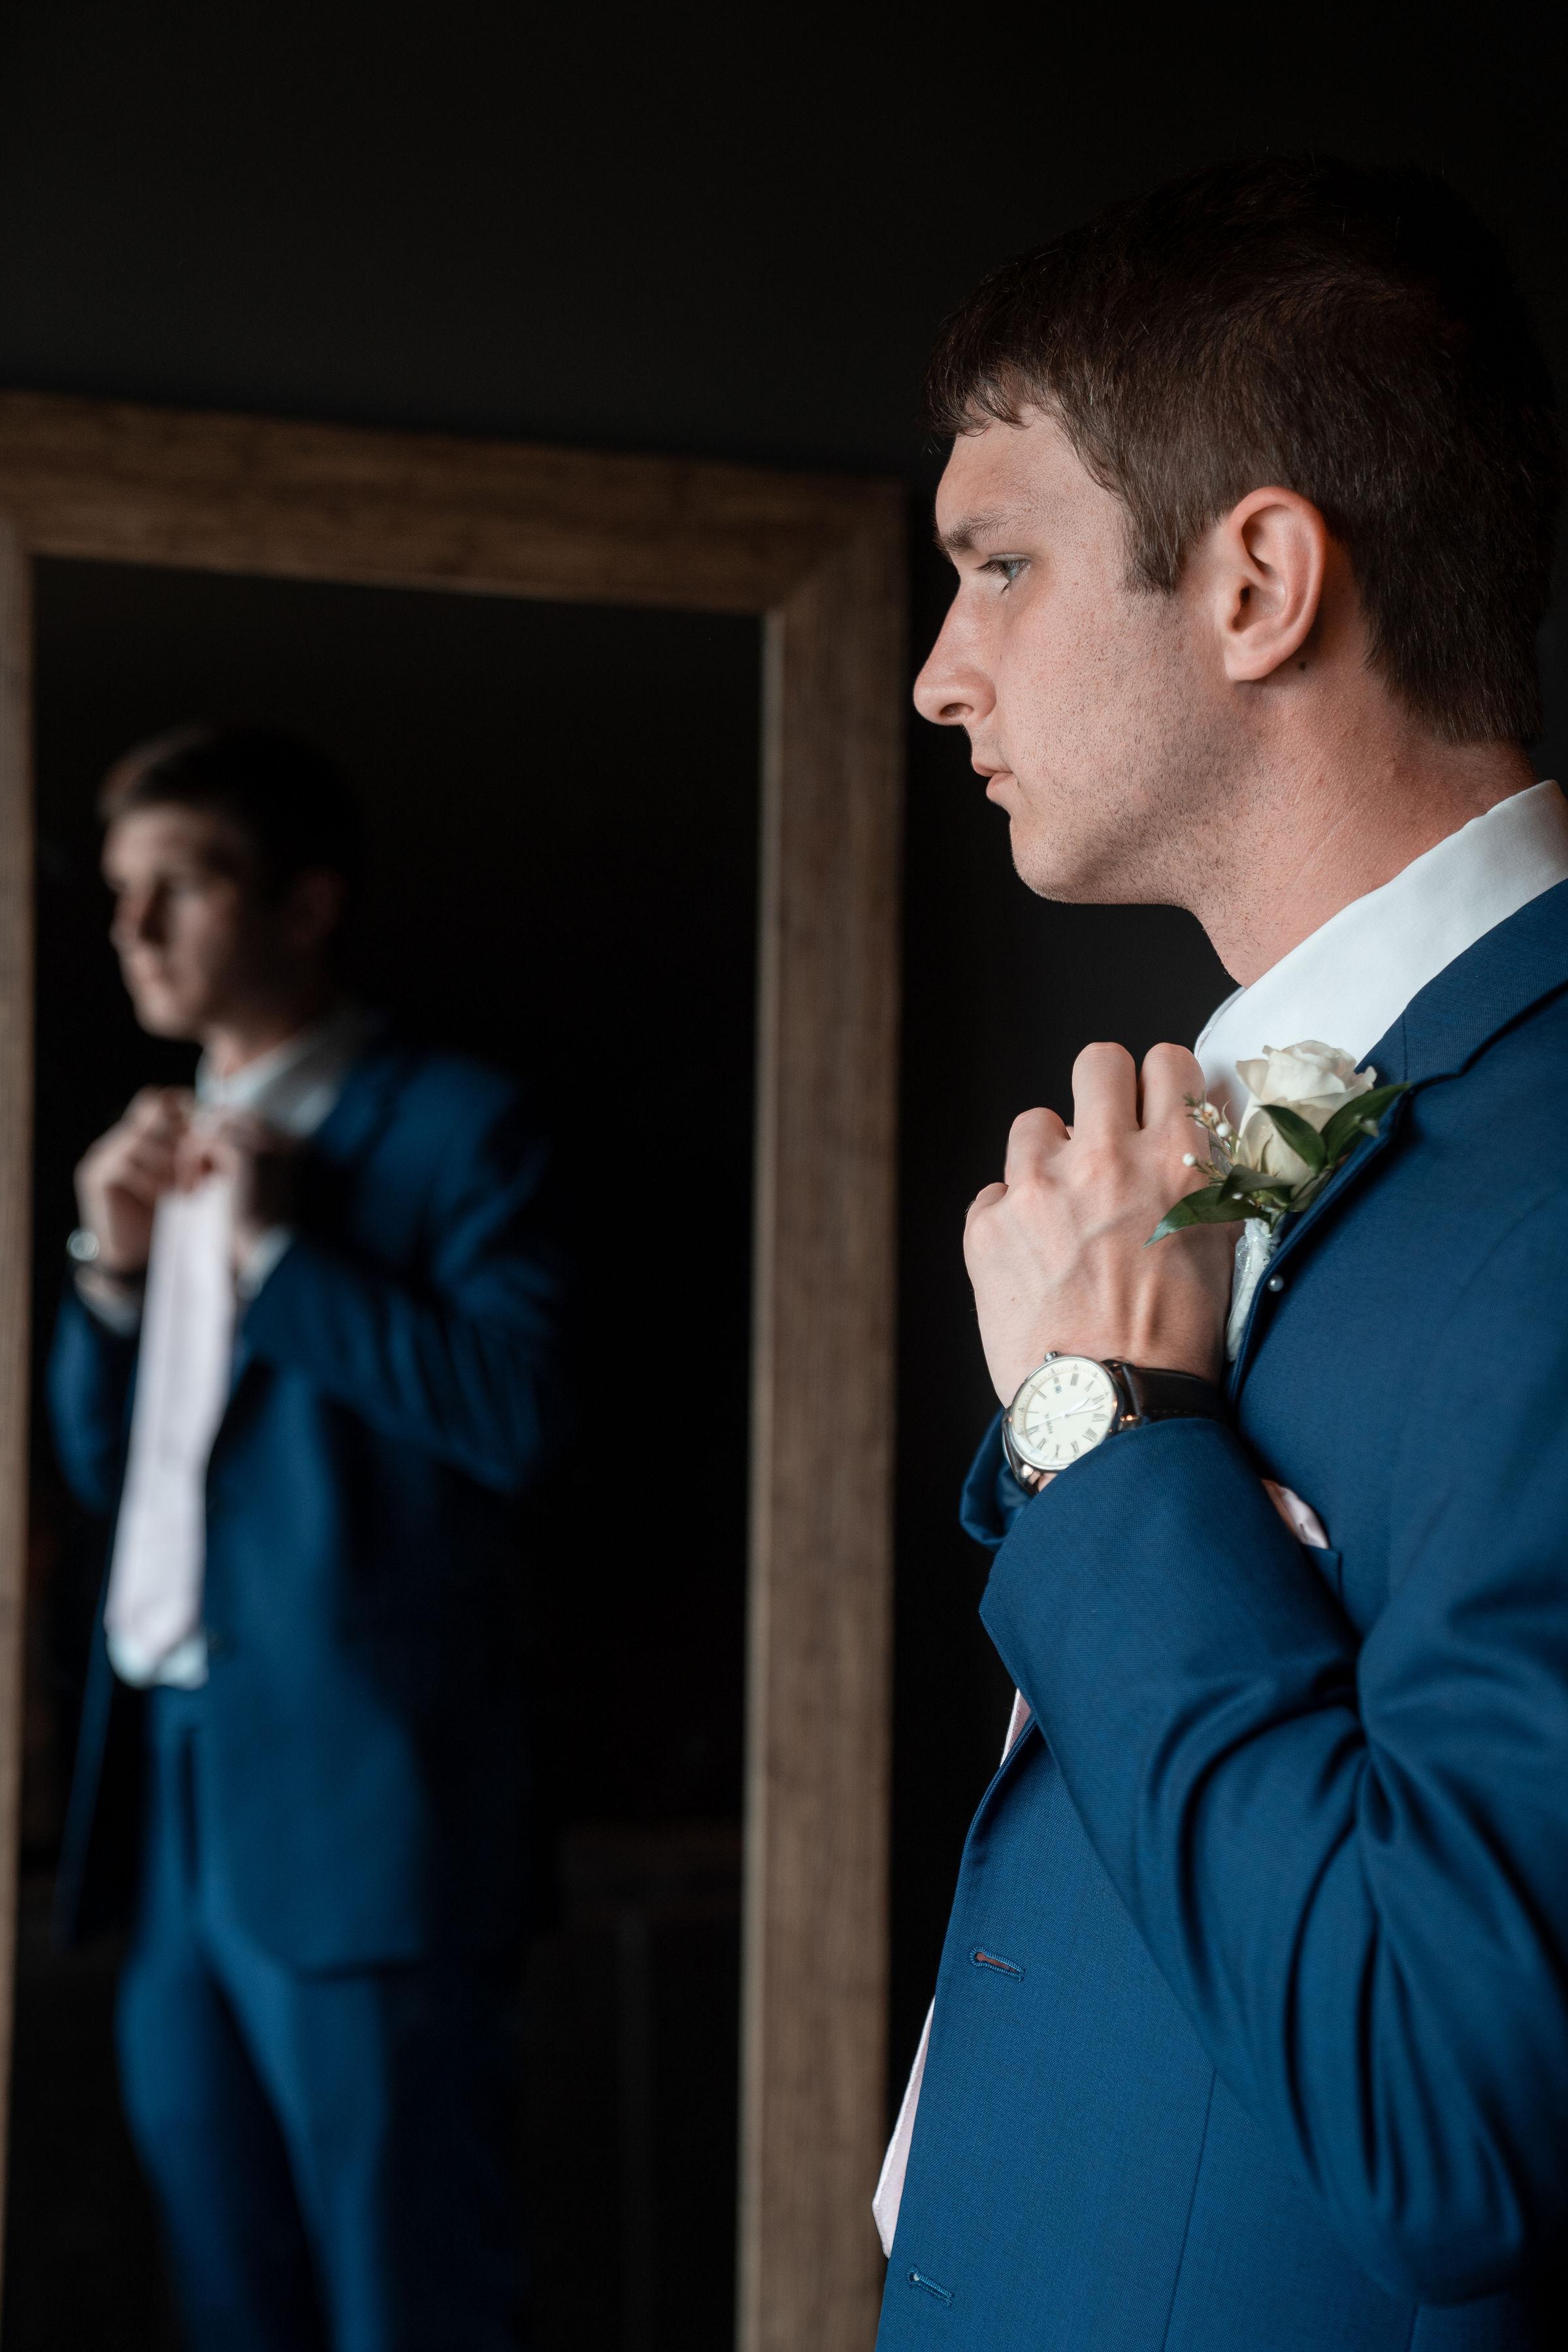 groom getting ready in the morror .jpg